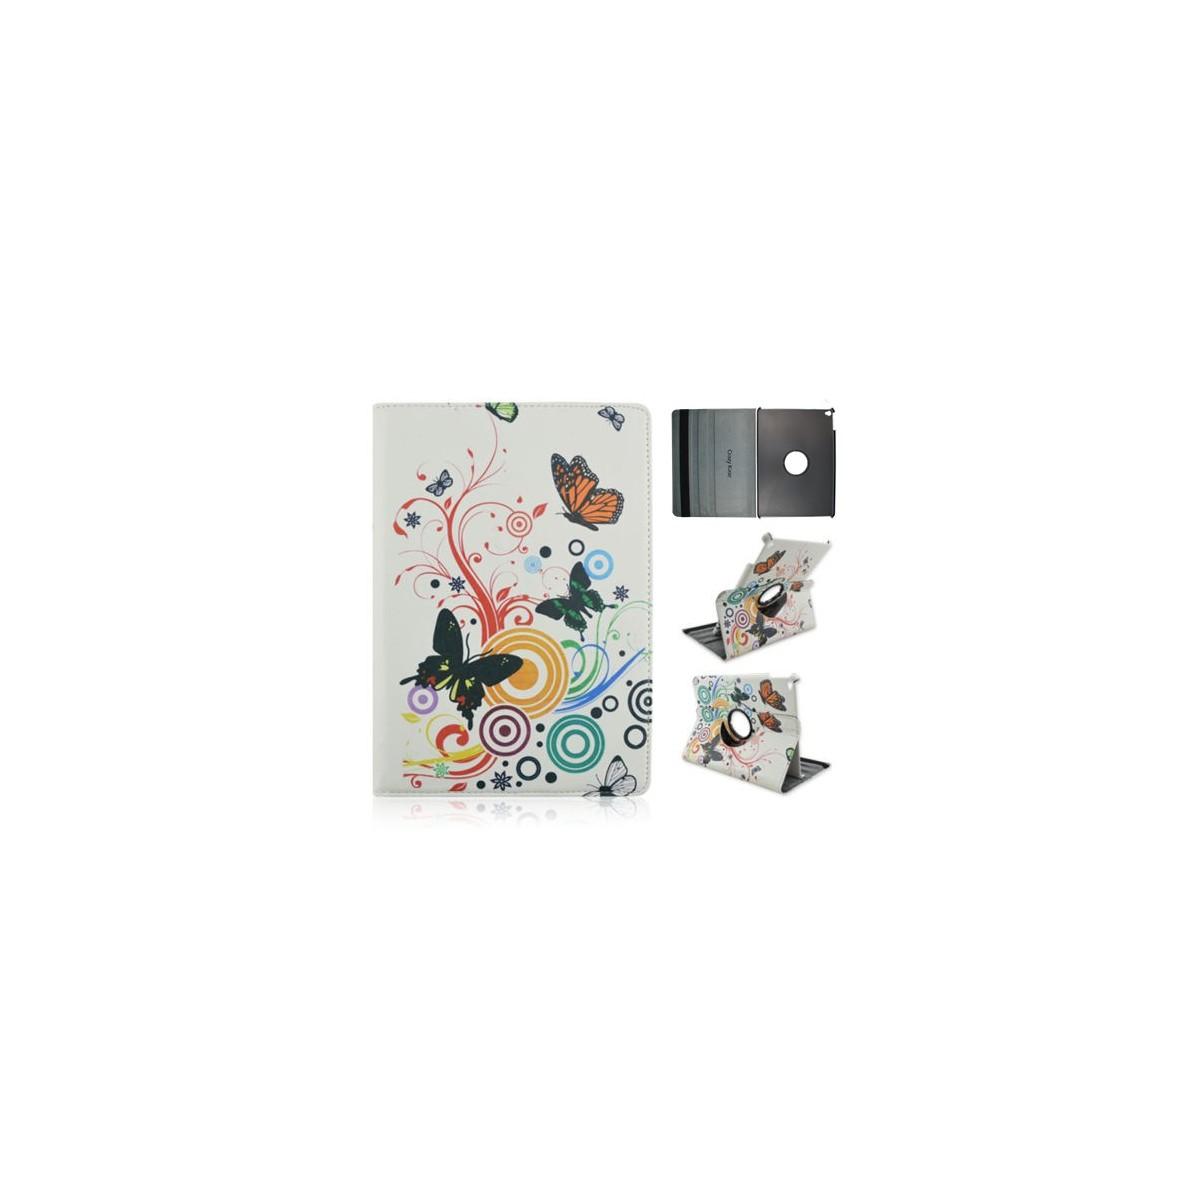 Crazy Kase - Etui iPad Air 2 Rotatif 360° motif Papillons et Cercles